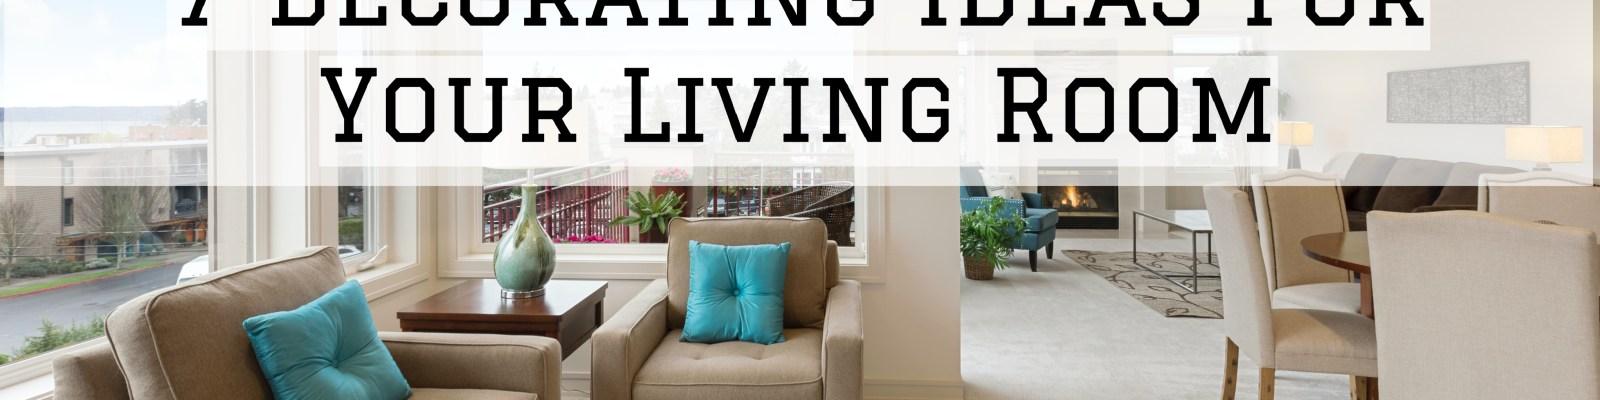 2021-06-02 Selah Painting St. Louis MO Living Room Decorating Ideas